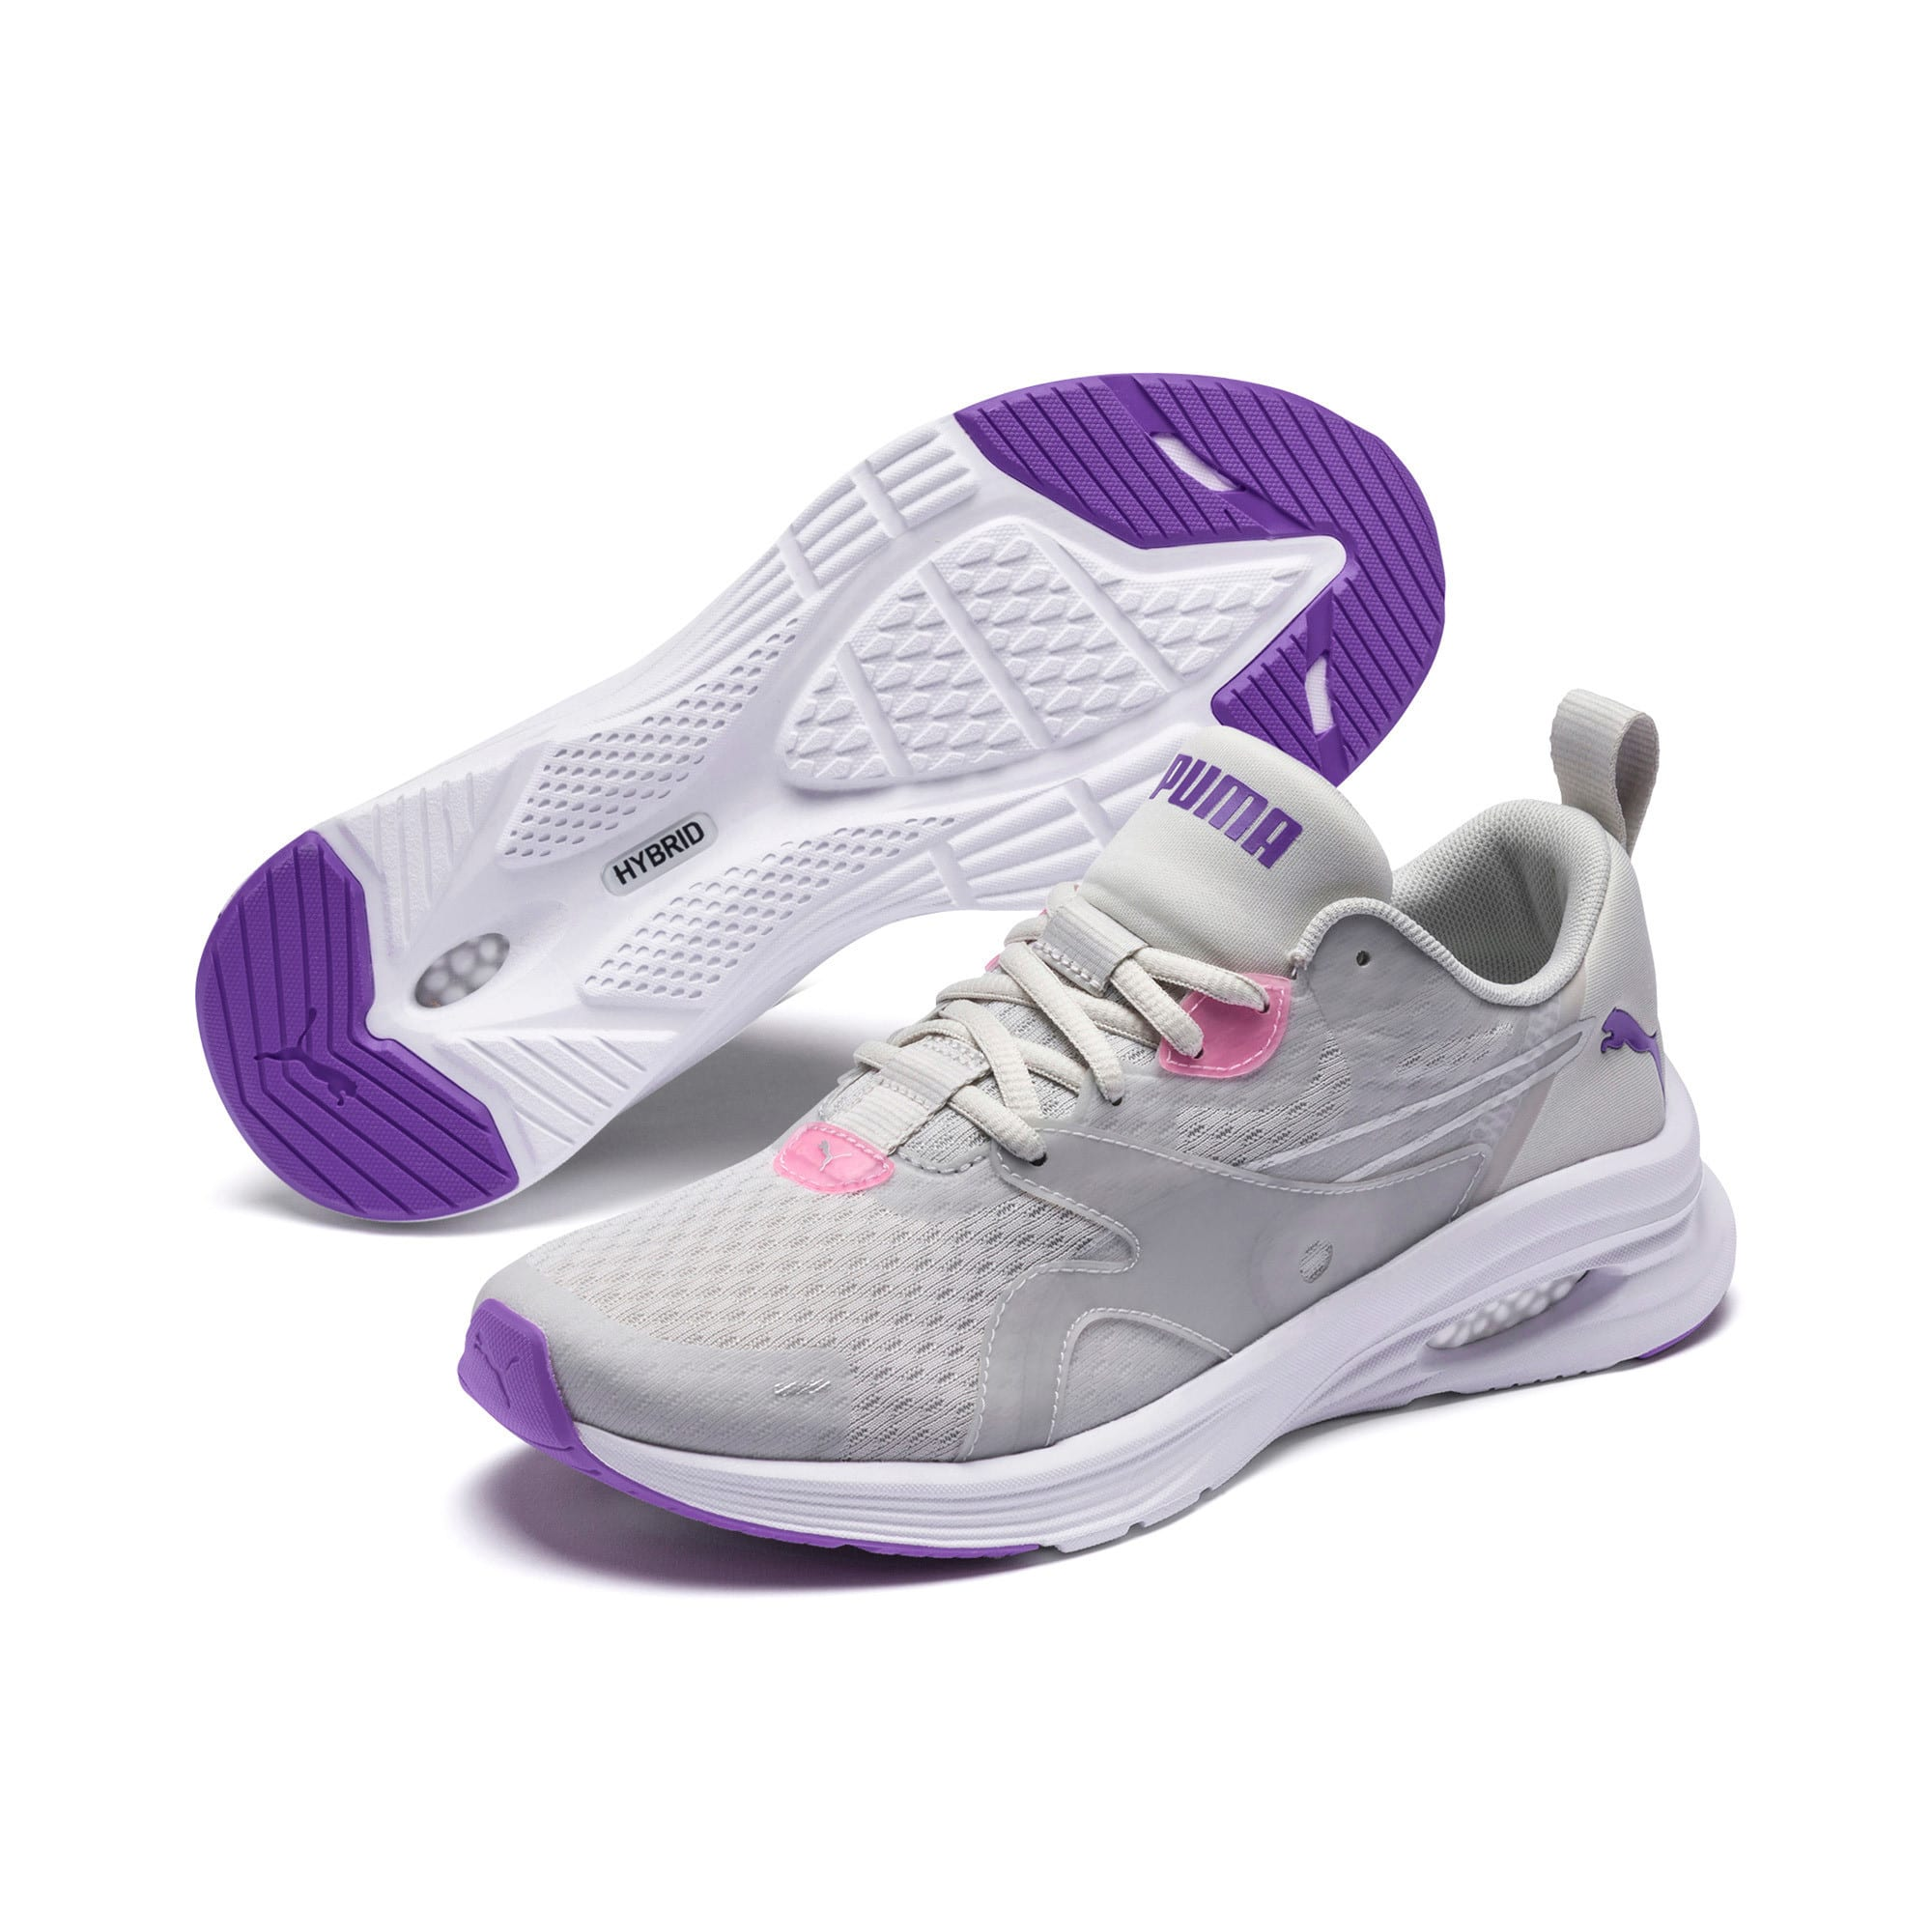 Thumbnail 2 of HYBRID Fuego Women's Running Shoes, Glacier Gray-Purple Glimmer, medium